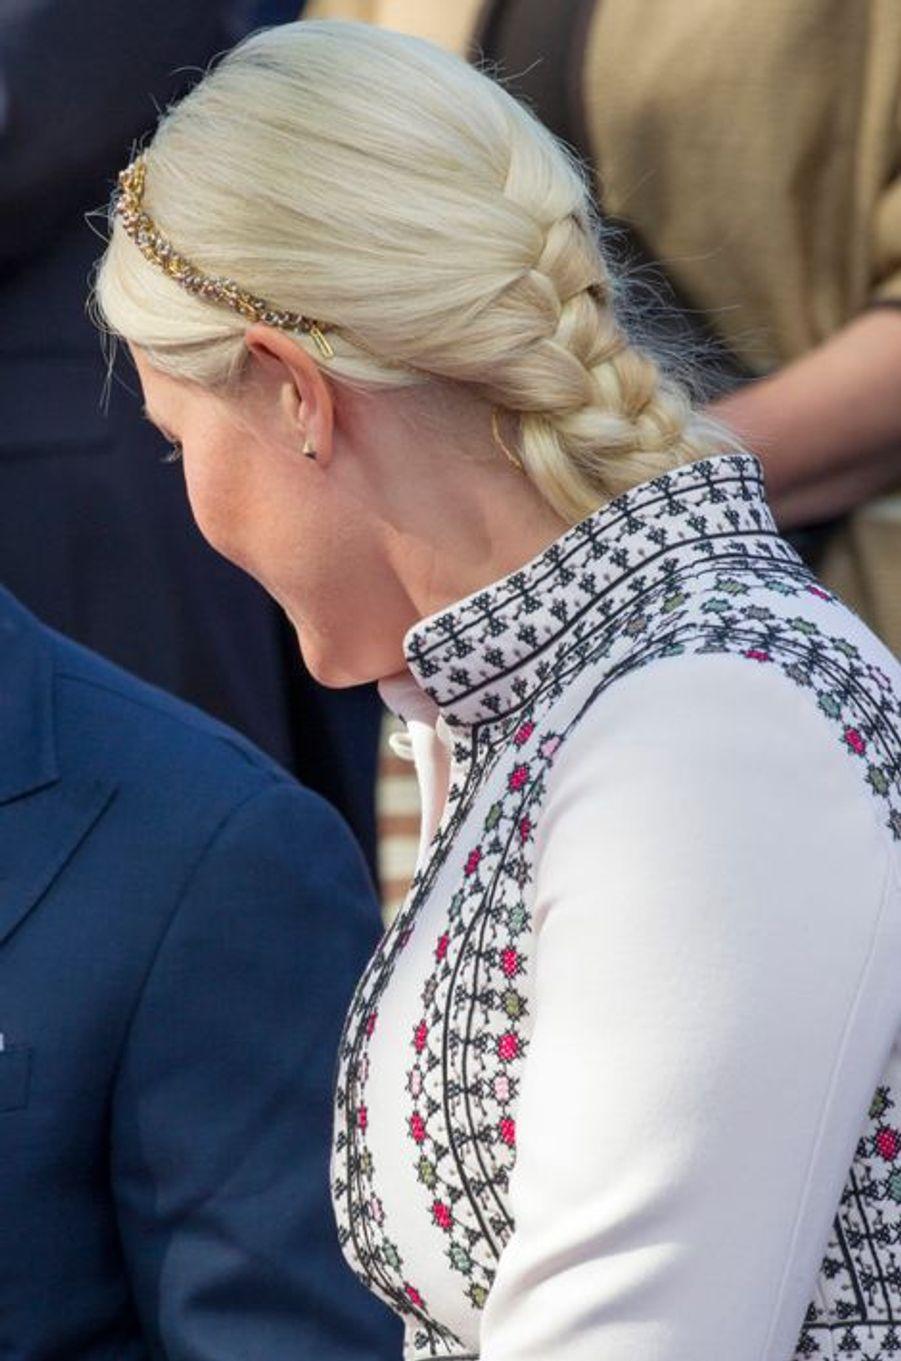 La princesse Mette-Marit de Norvège à Oslo, le 7 juin 2015